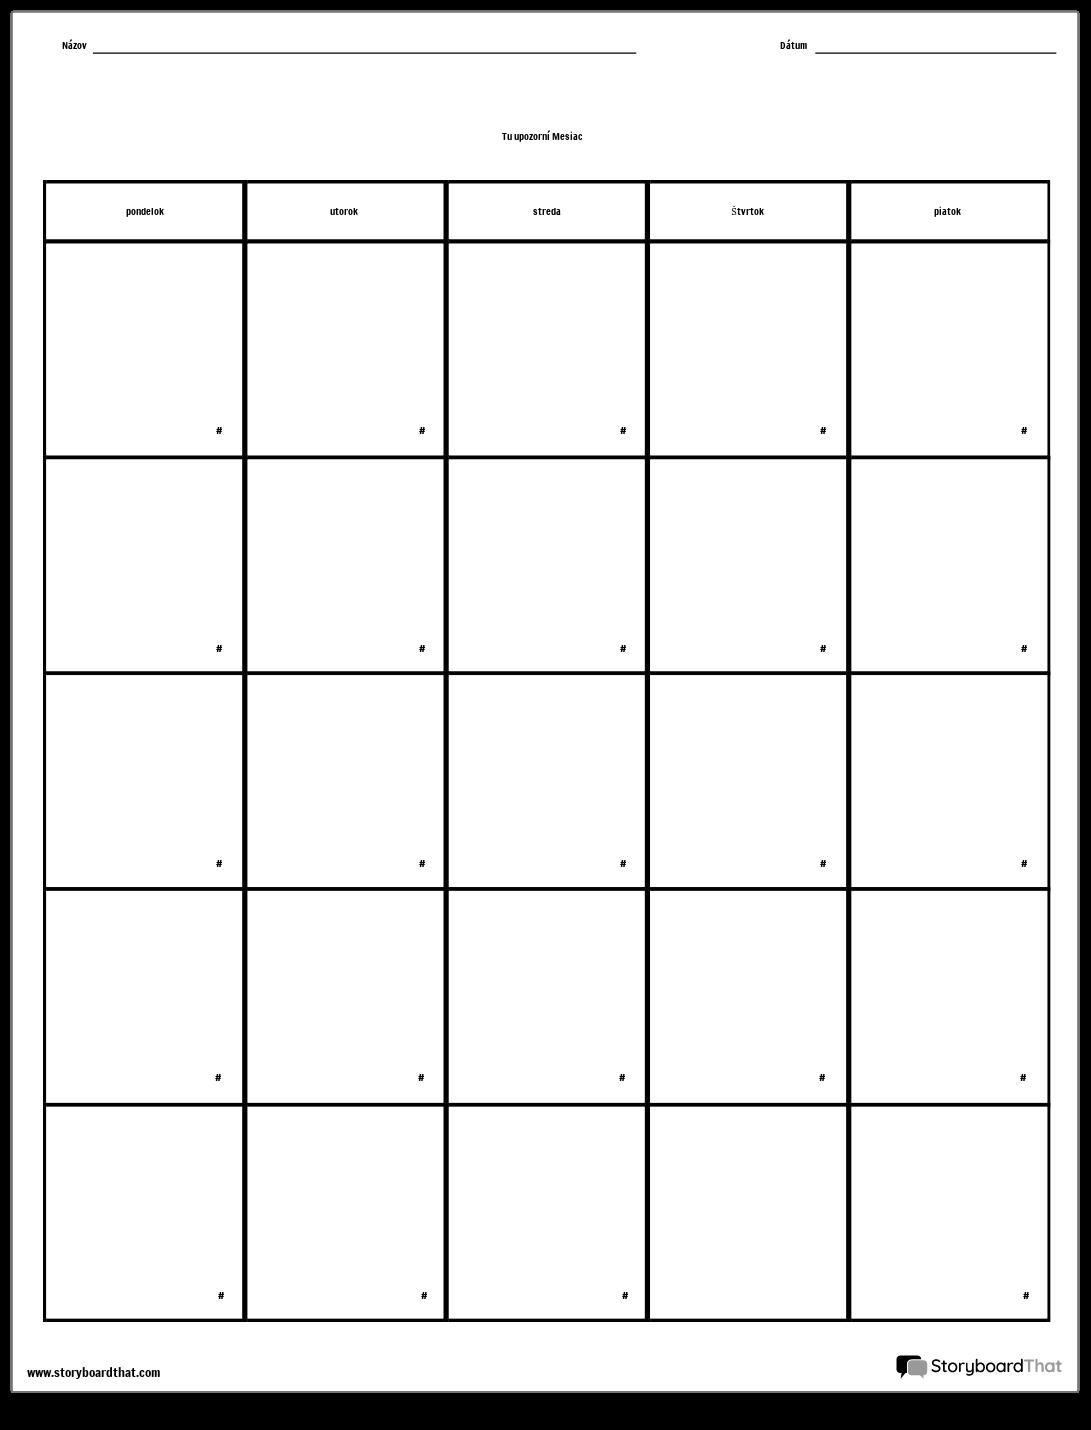 foto kalendar sk Kalendár   Týždeň Storyboard by sk examples foto kalendar sk